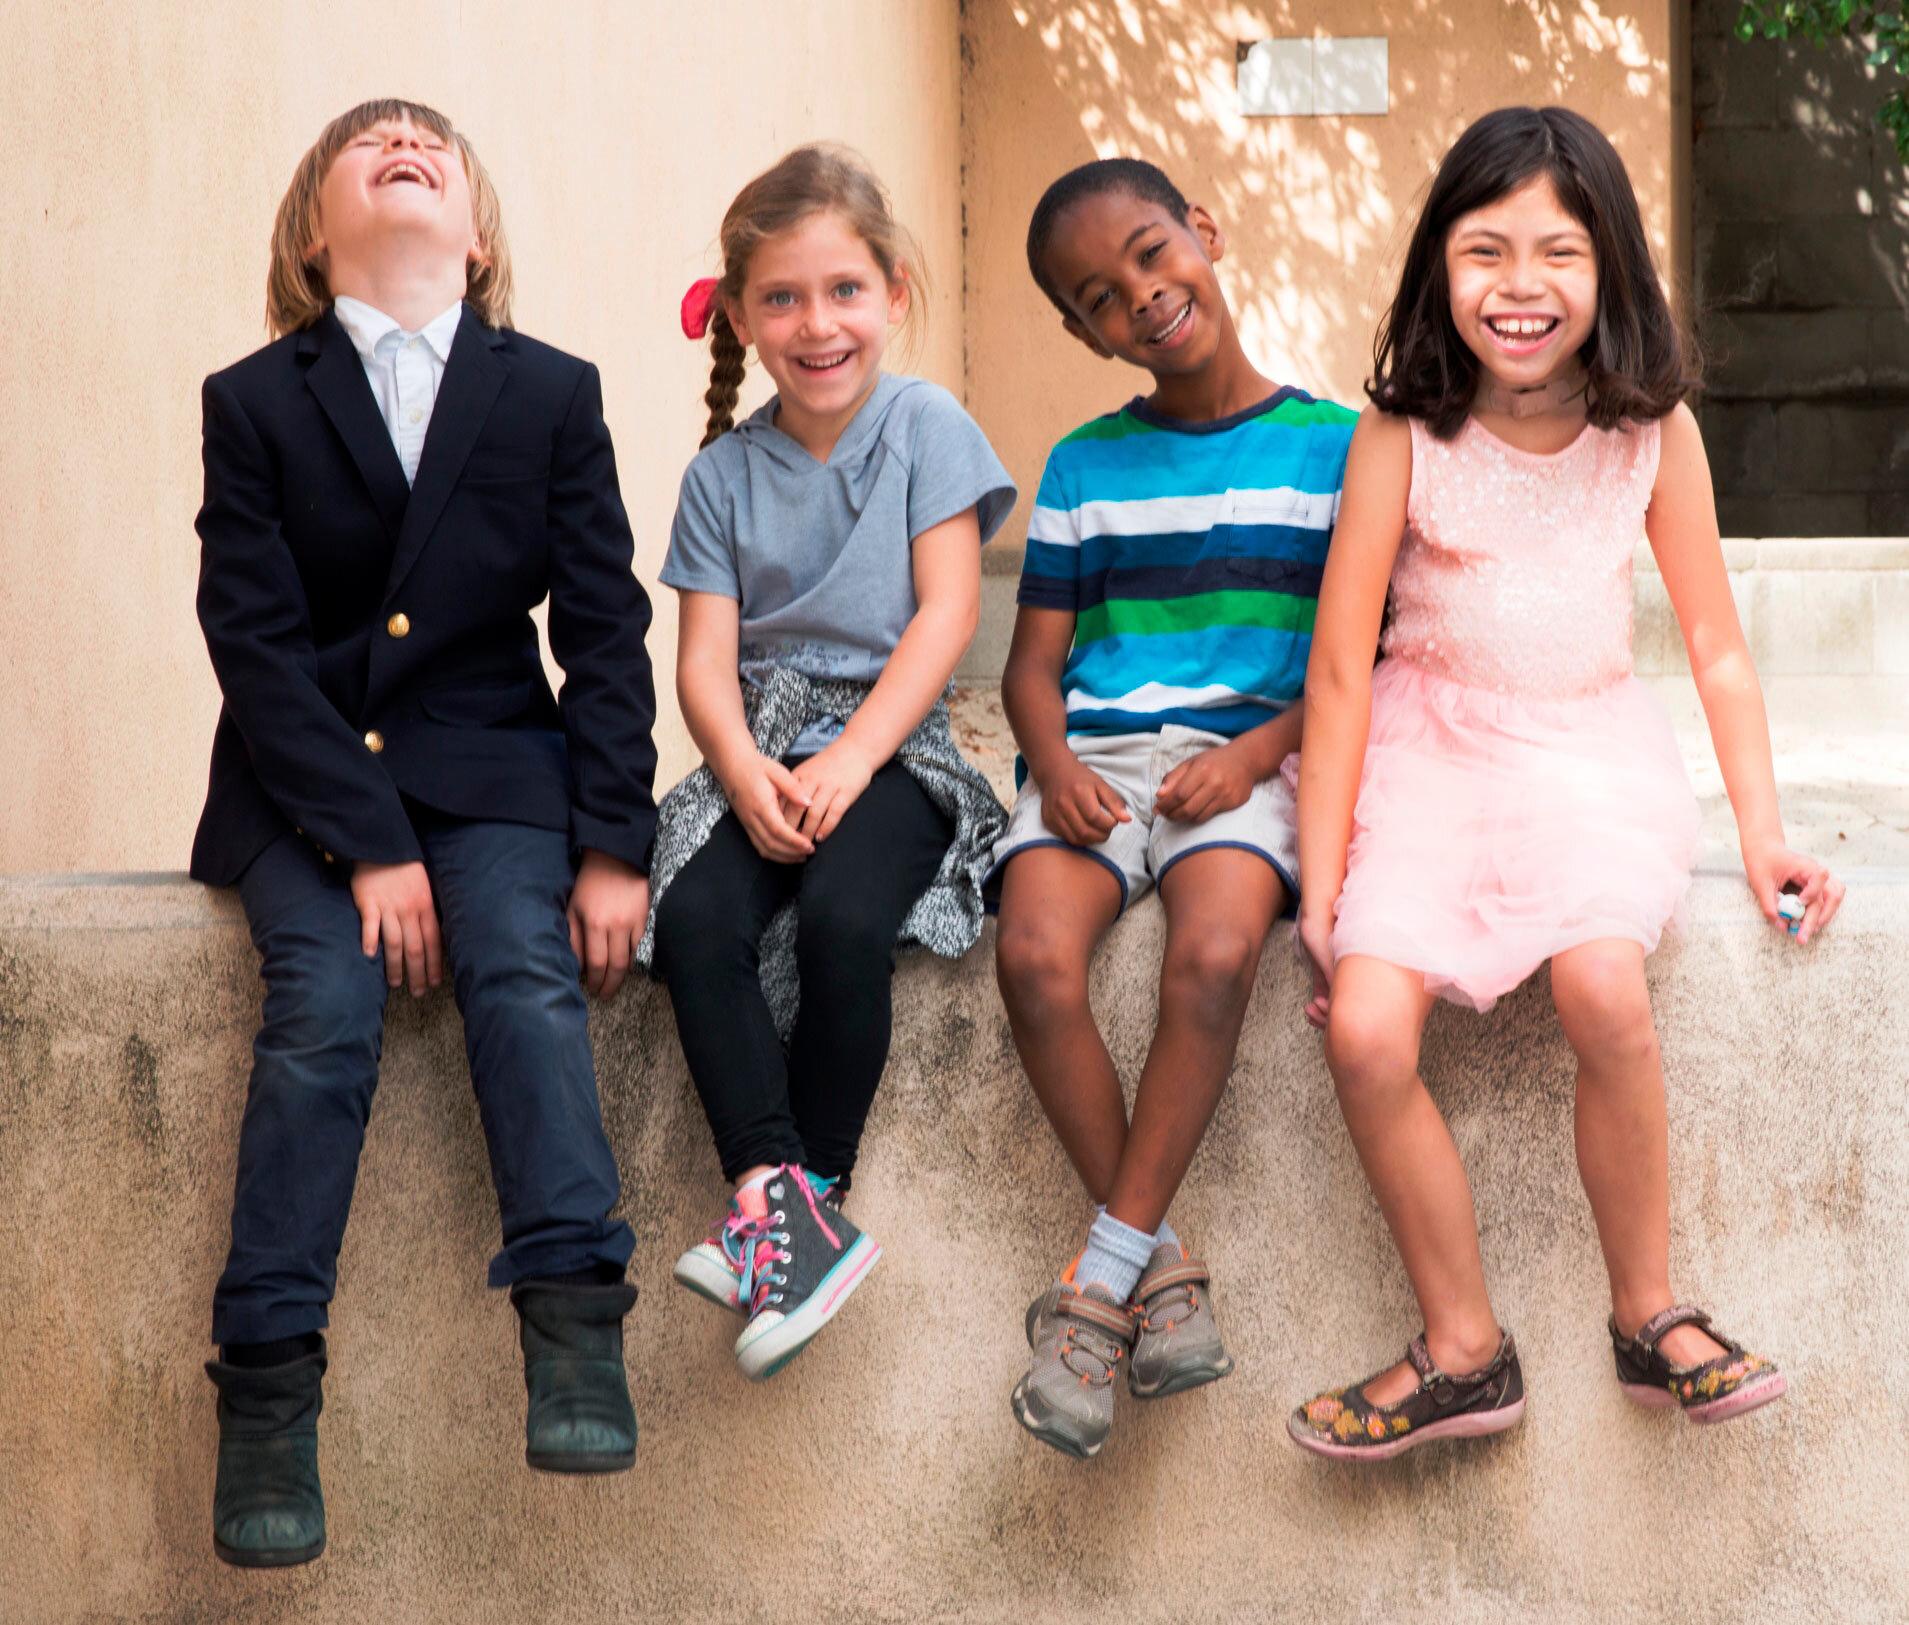 playground-four kids on wall web.jpg